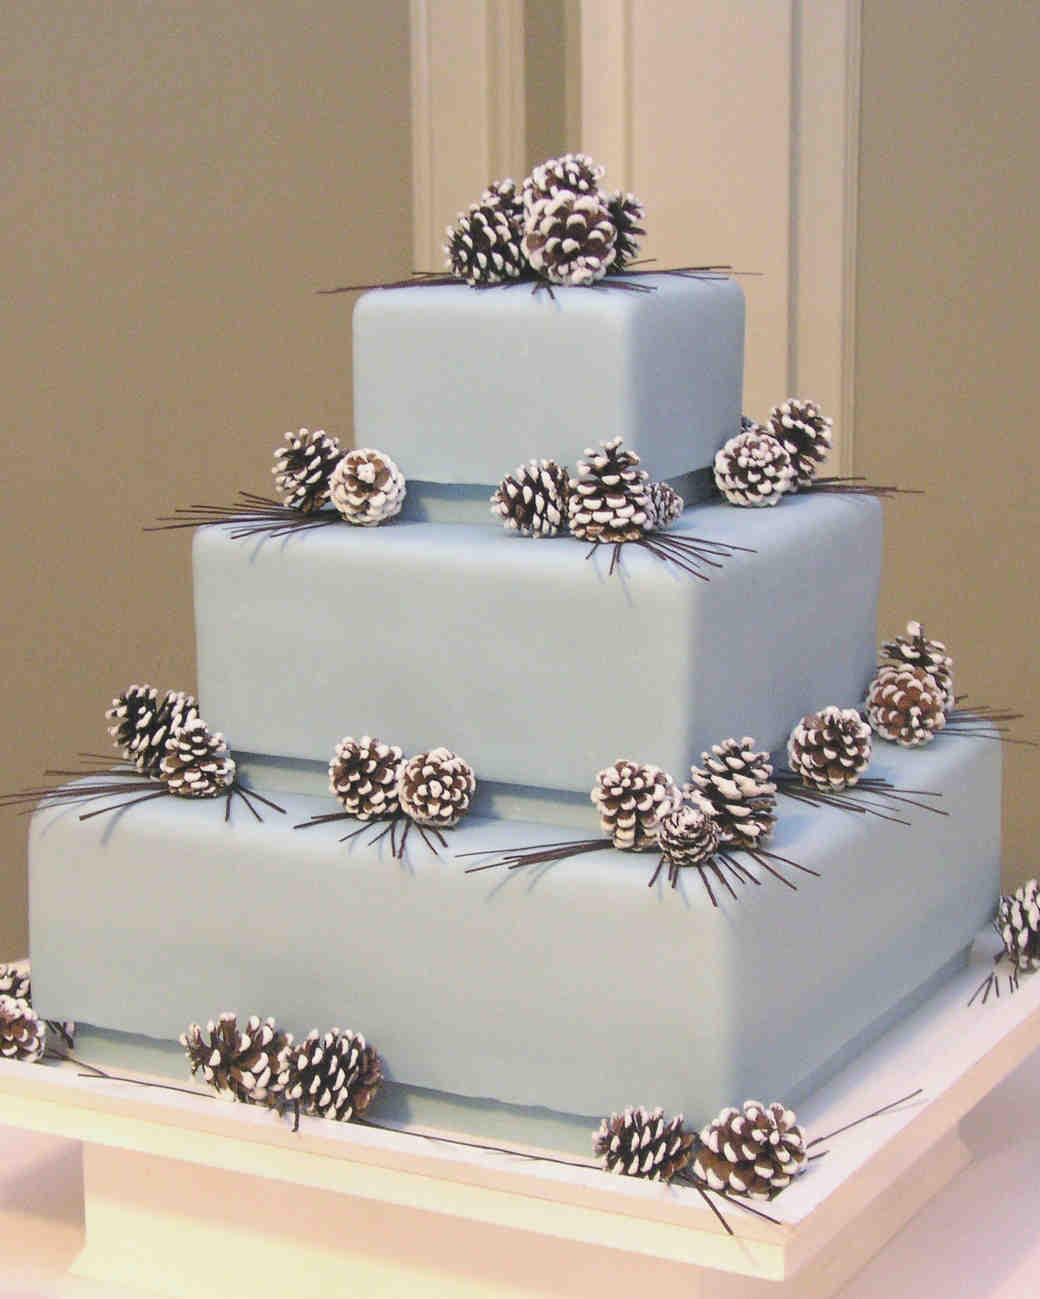 cake-pros-gateaux-0414.jpg